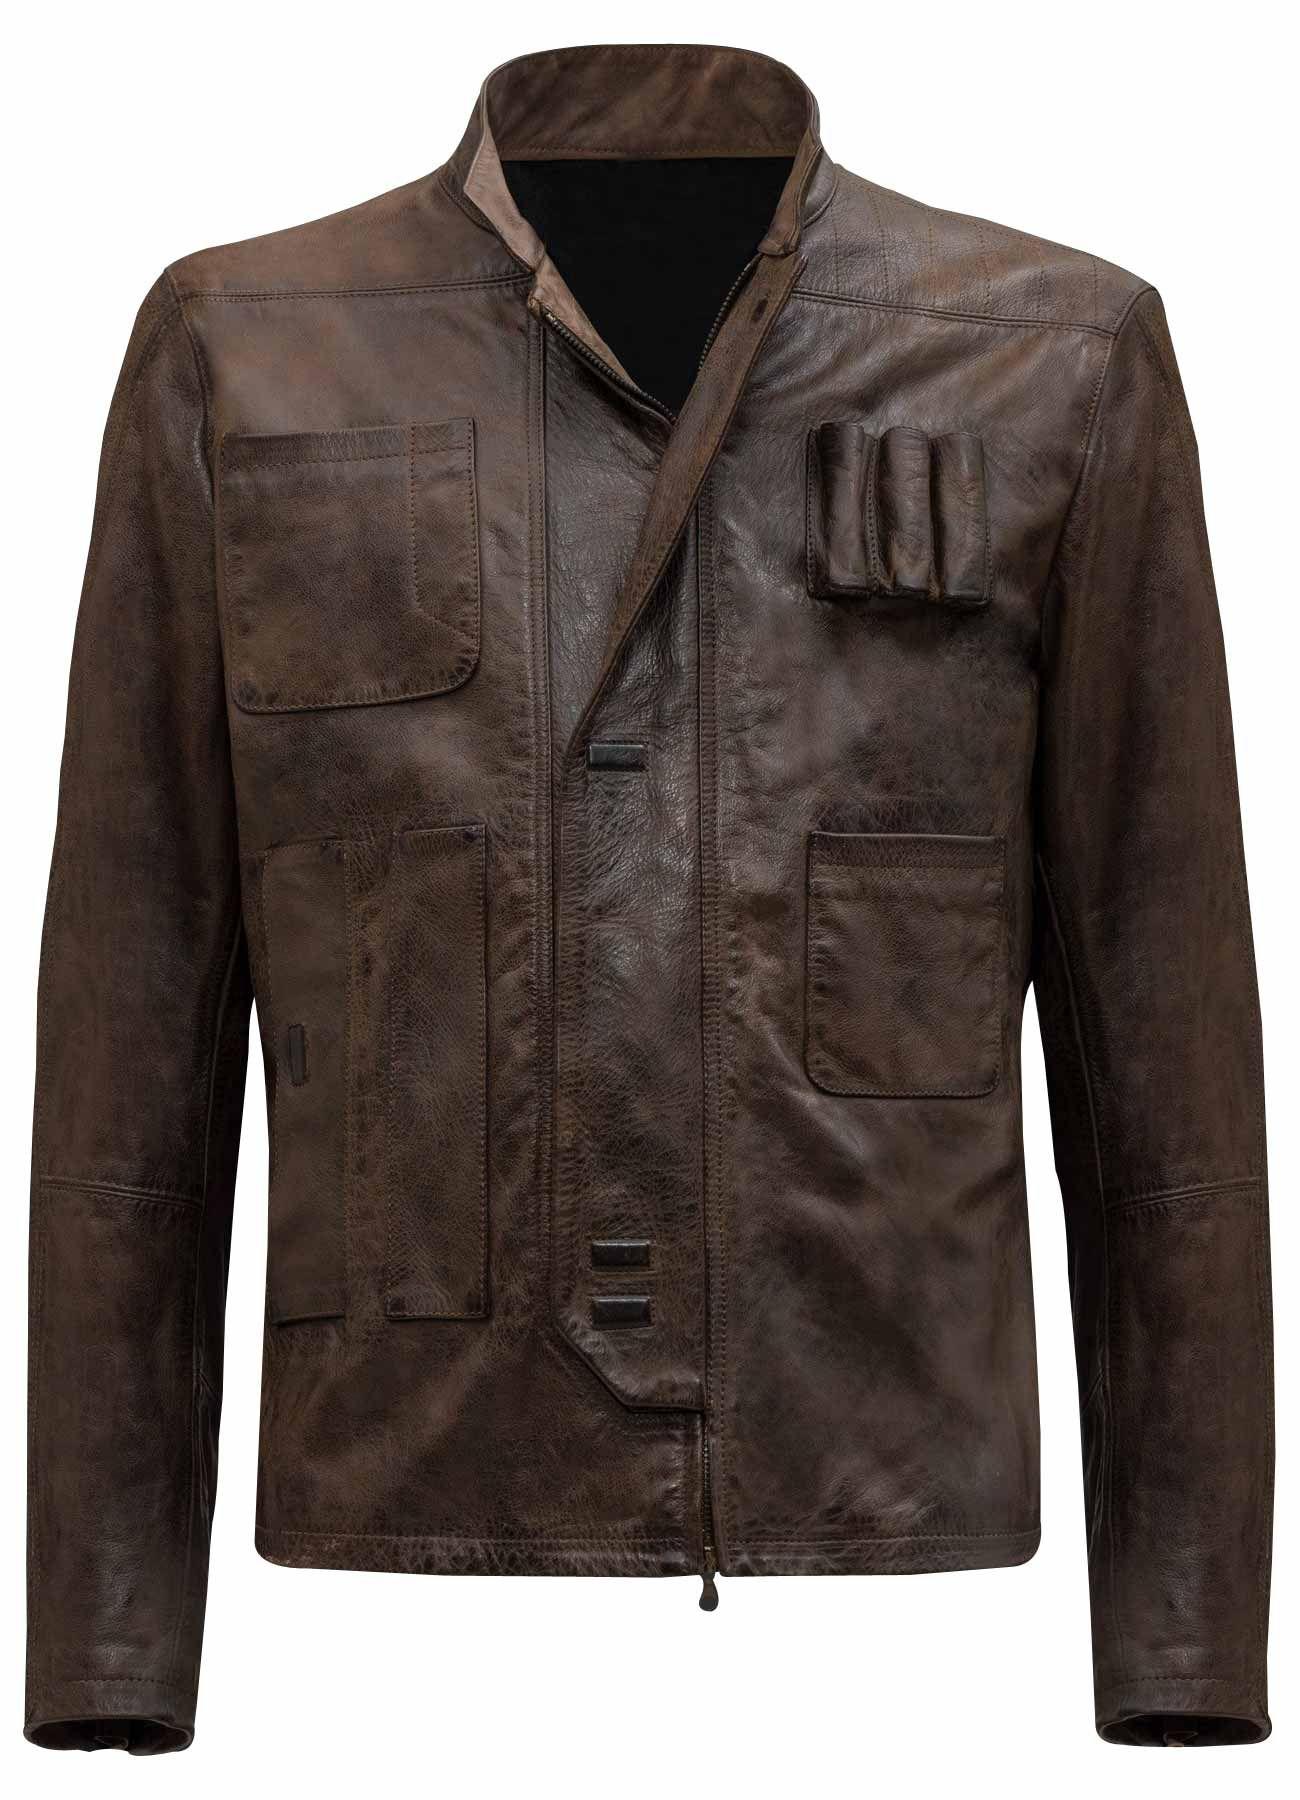 Star Wars Tfa Han Solo Leather Jacket Han Solo Jacket Leather Jacket Star Wars Jacket [ 1800 x 1300 Pixel ]